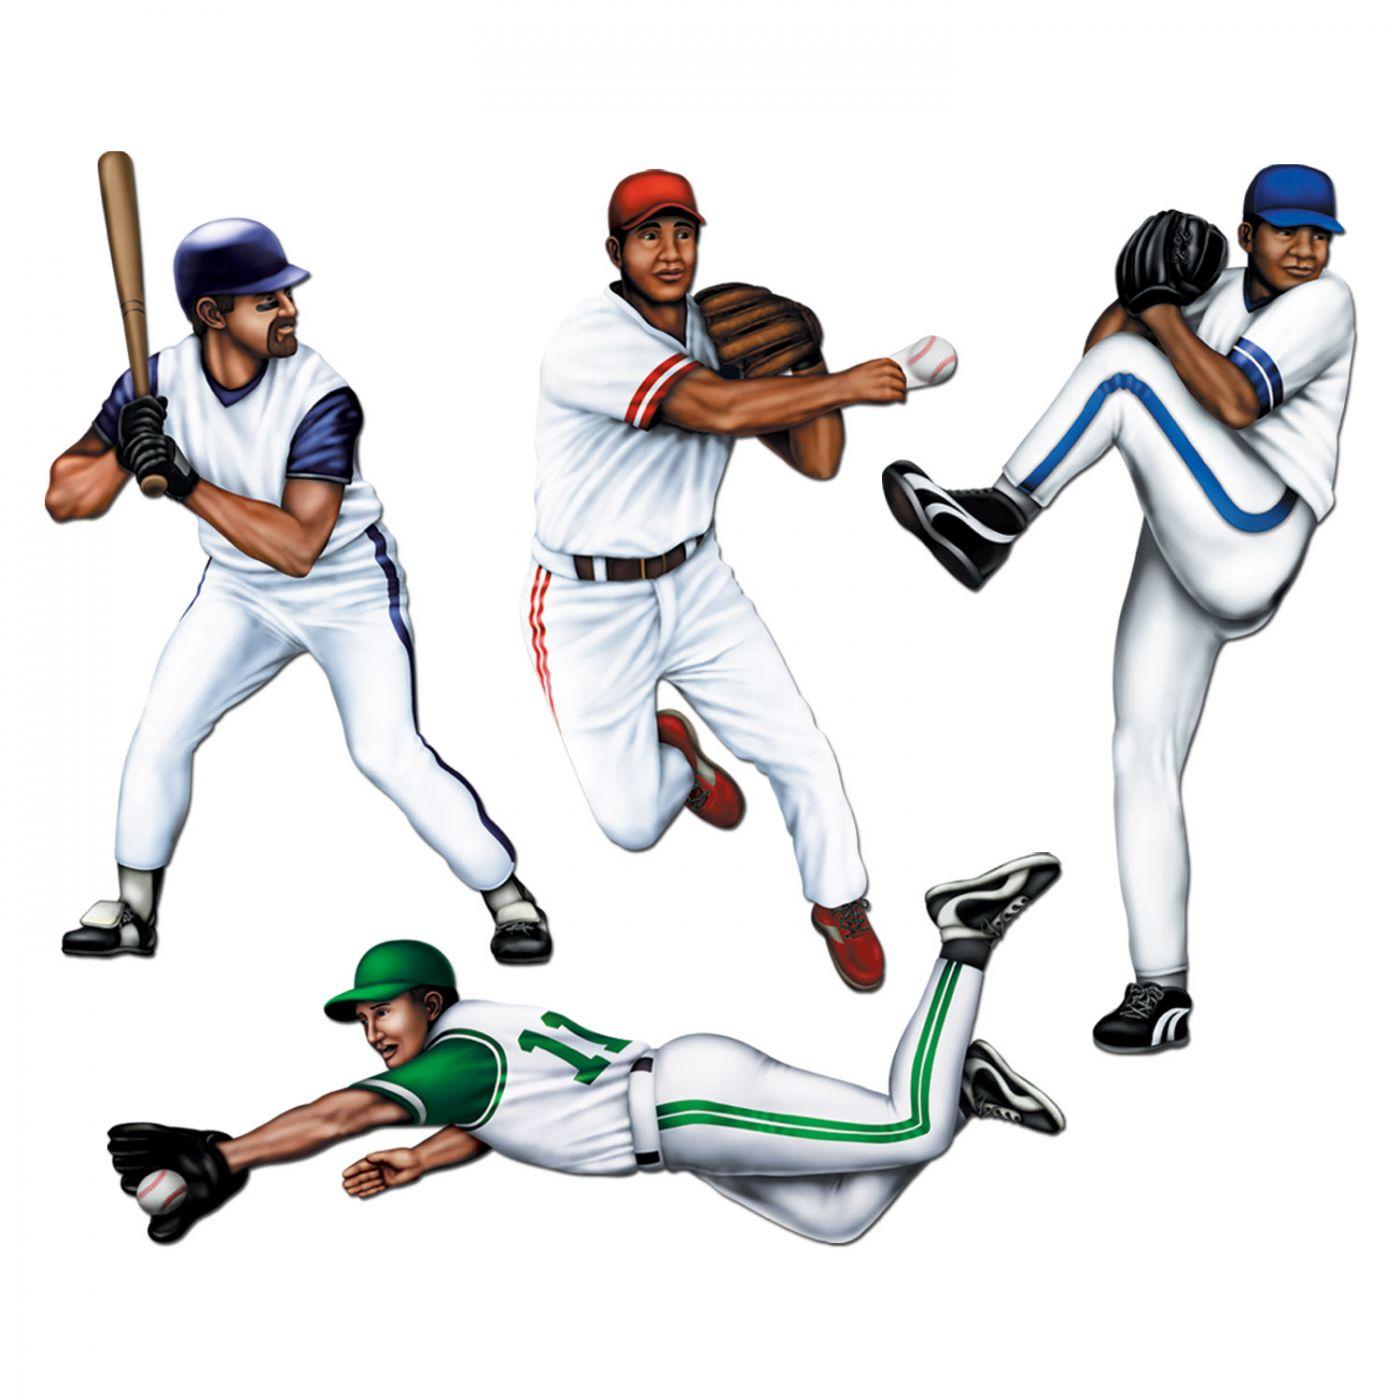 Baseball Cutouts image